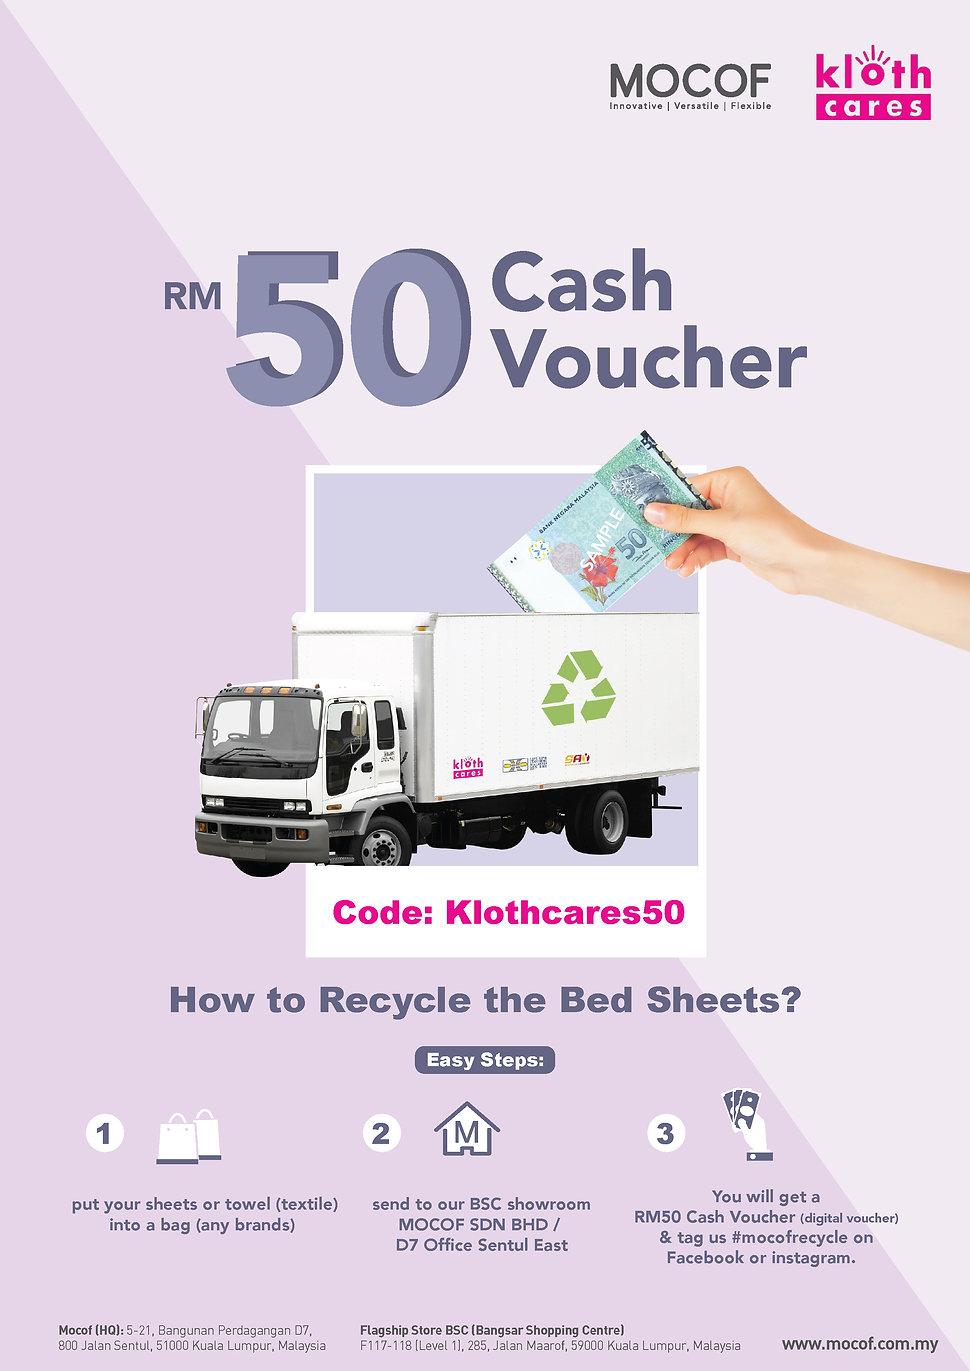 Mocof_KlothCare_Recycling_RM50_v1-01.jpg